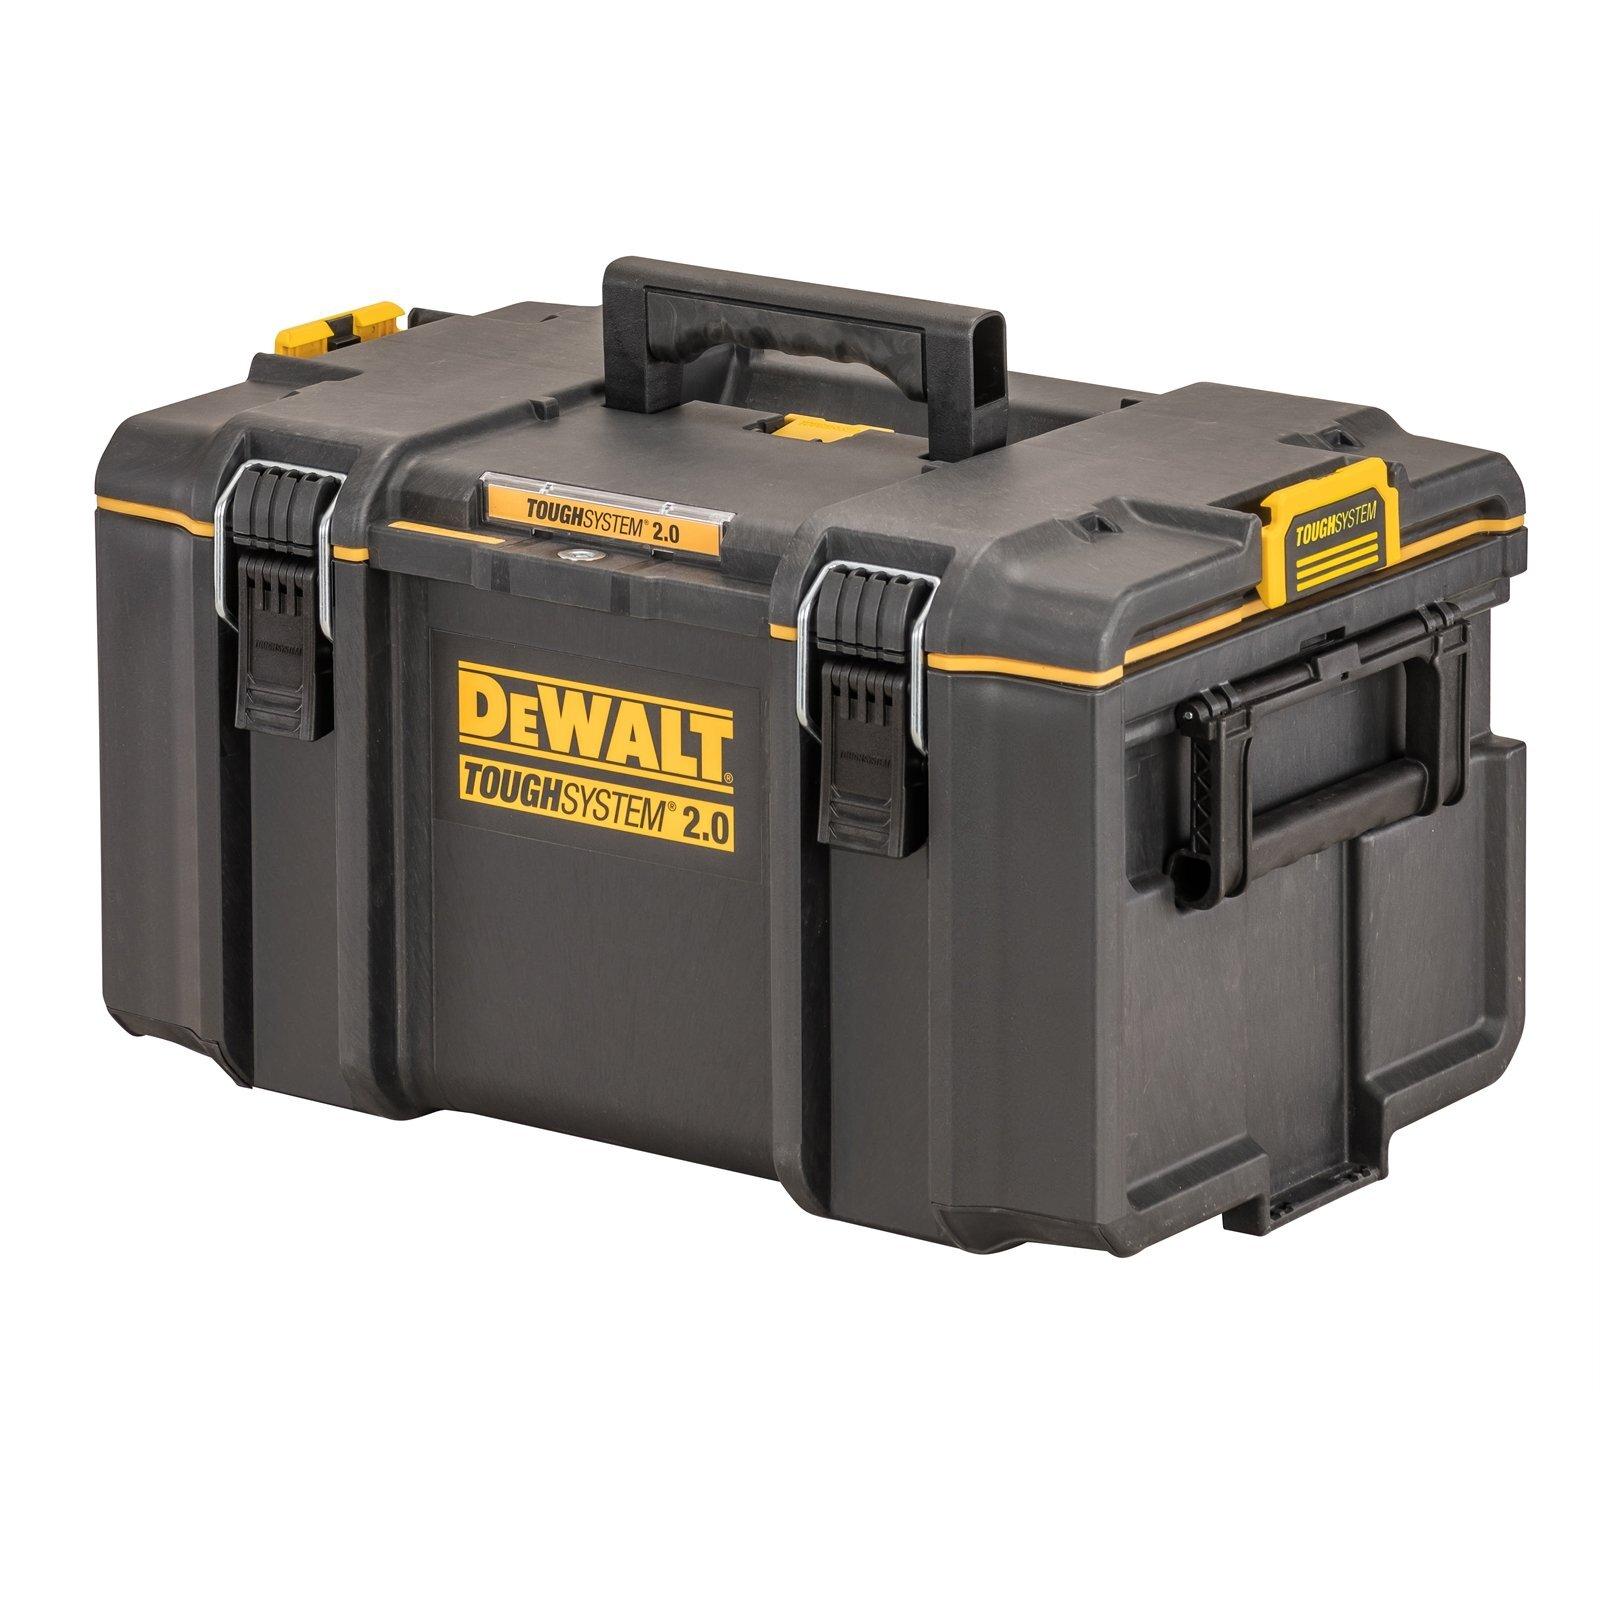 DeWALT ToughSystem 2.0 Mid Tool Box